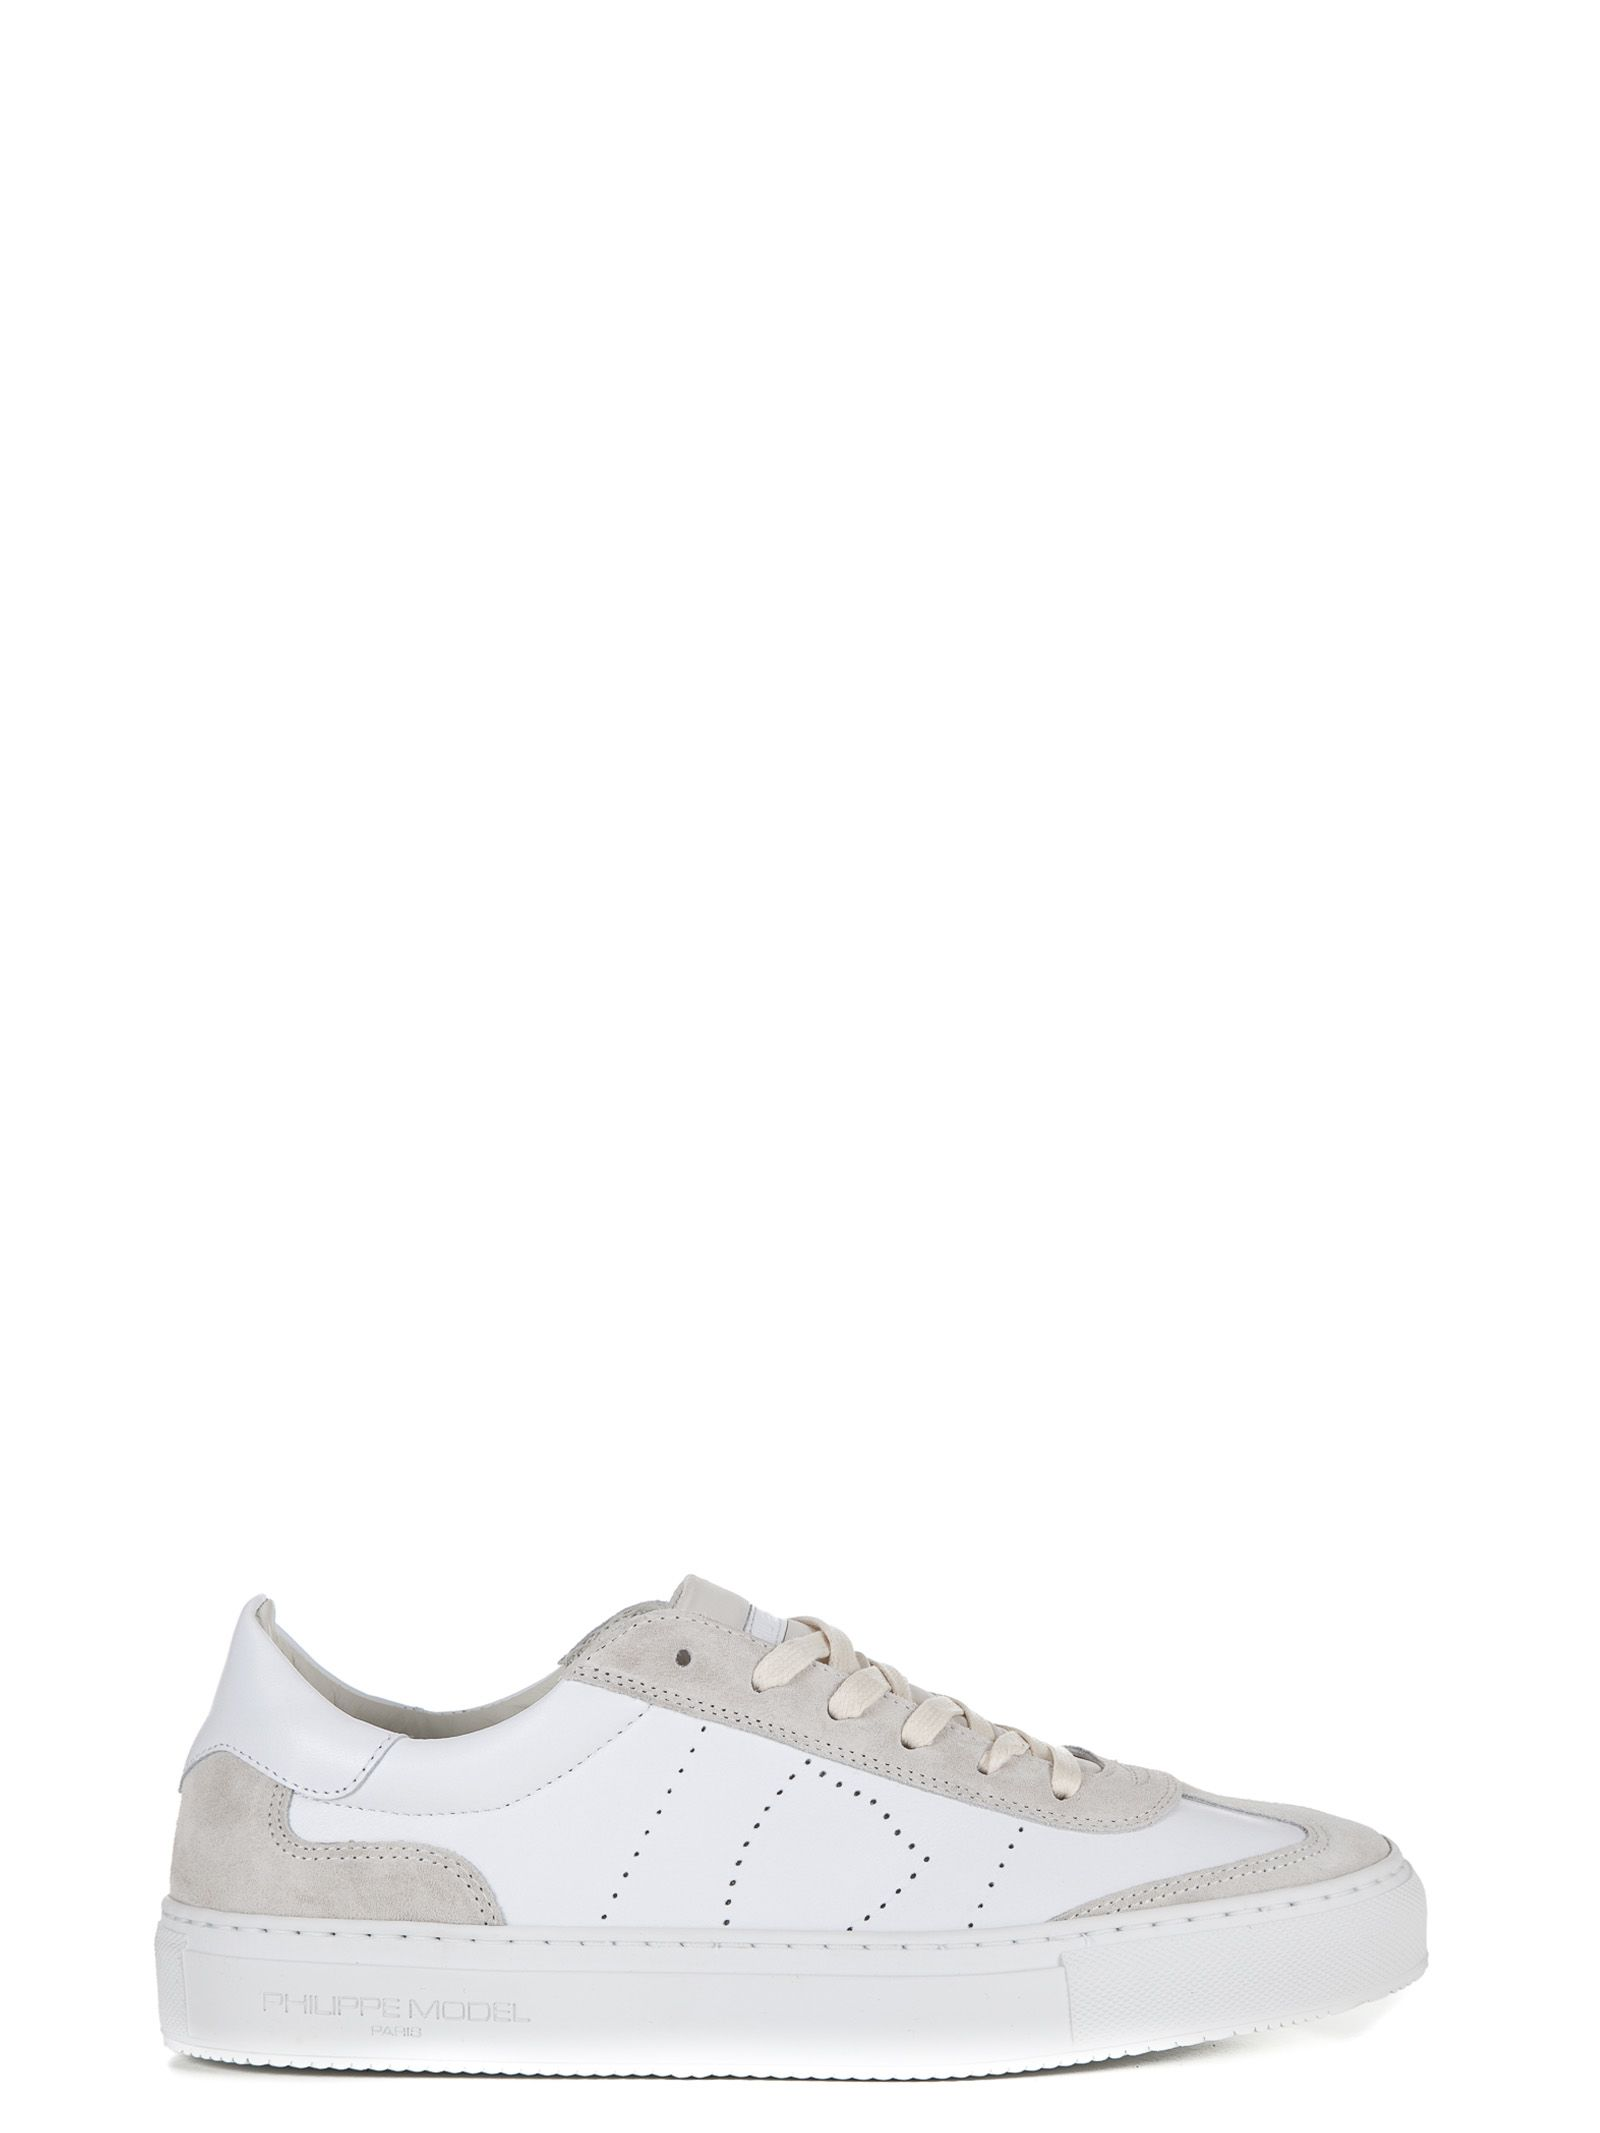 Belleville sneakers - White Philippe Model AUMyhbhmHt